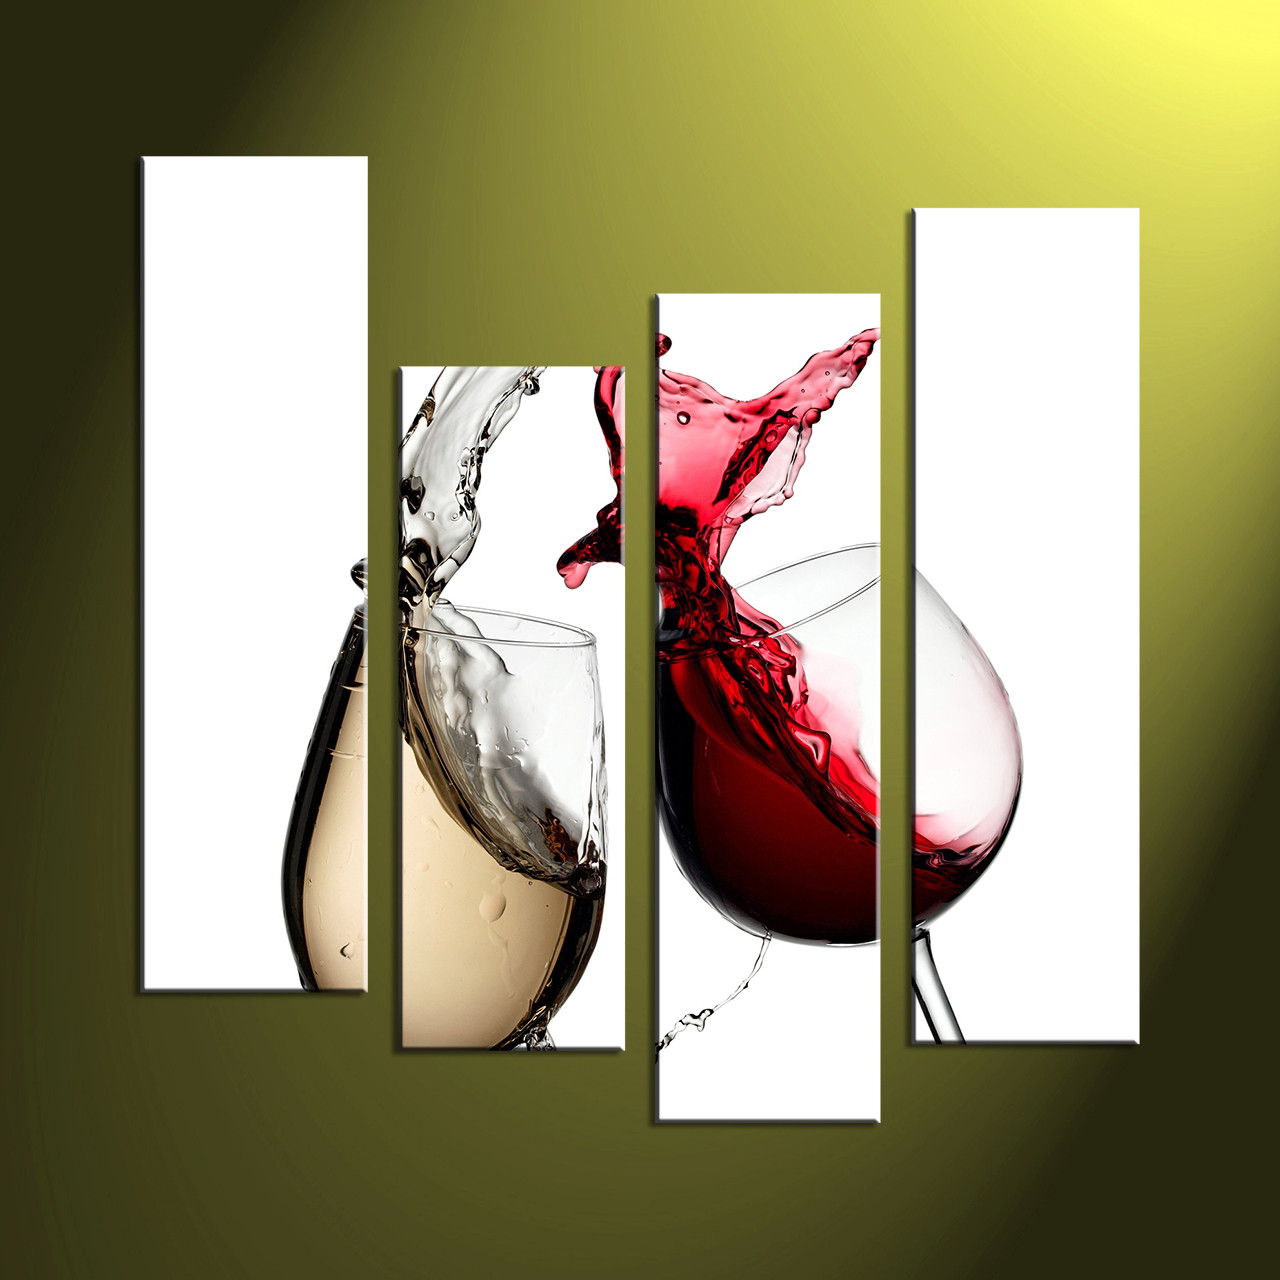 Purple Bowls Wine Bottels Modern Canvas Painting Wall Art: 4 Piece White Canvas Home Decor Red Wine Art